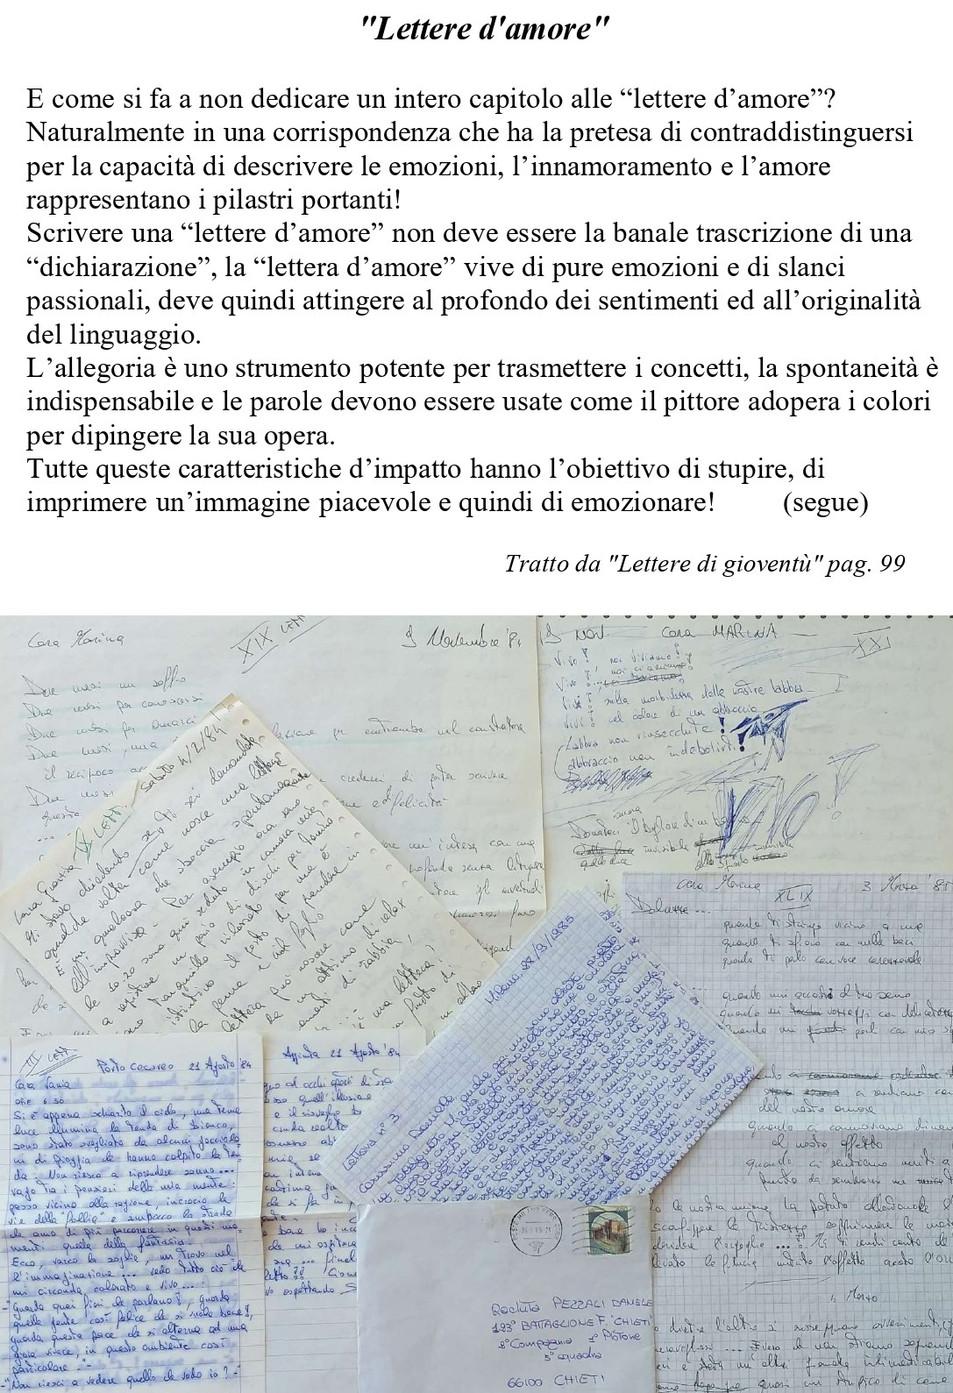 8 Poster Lettere d'amore.jpg